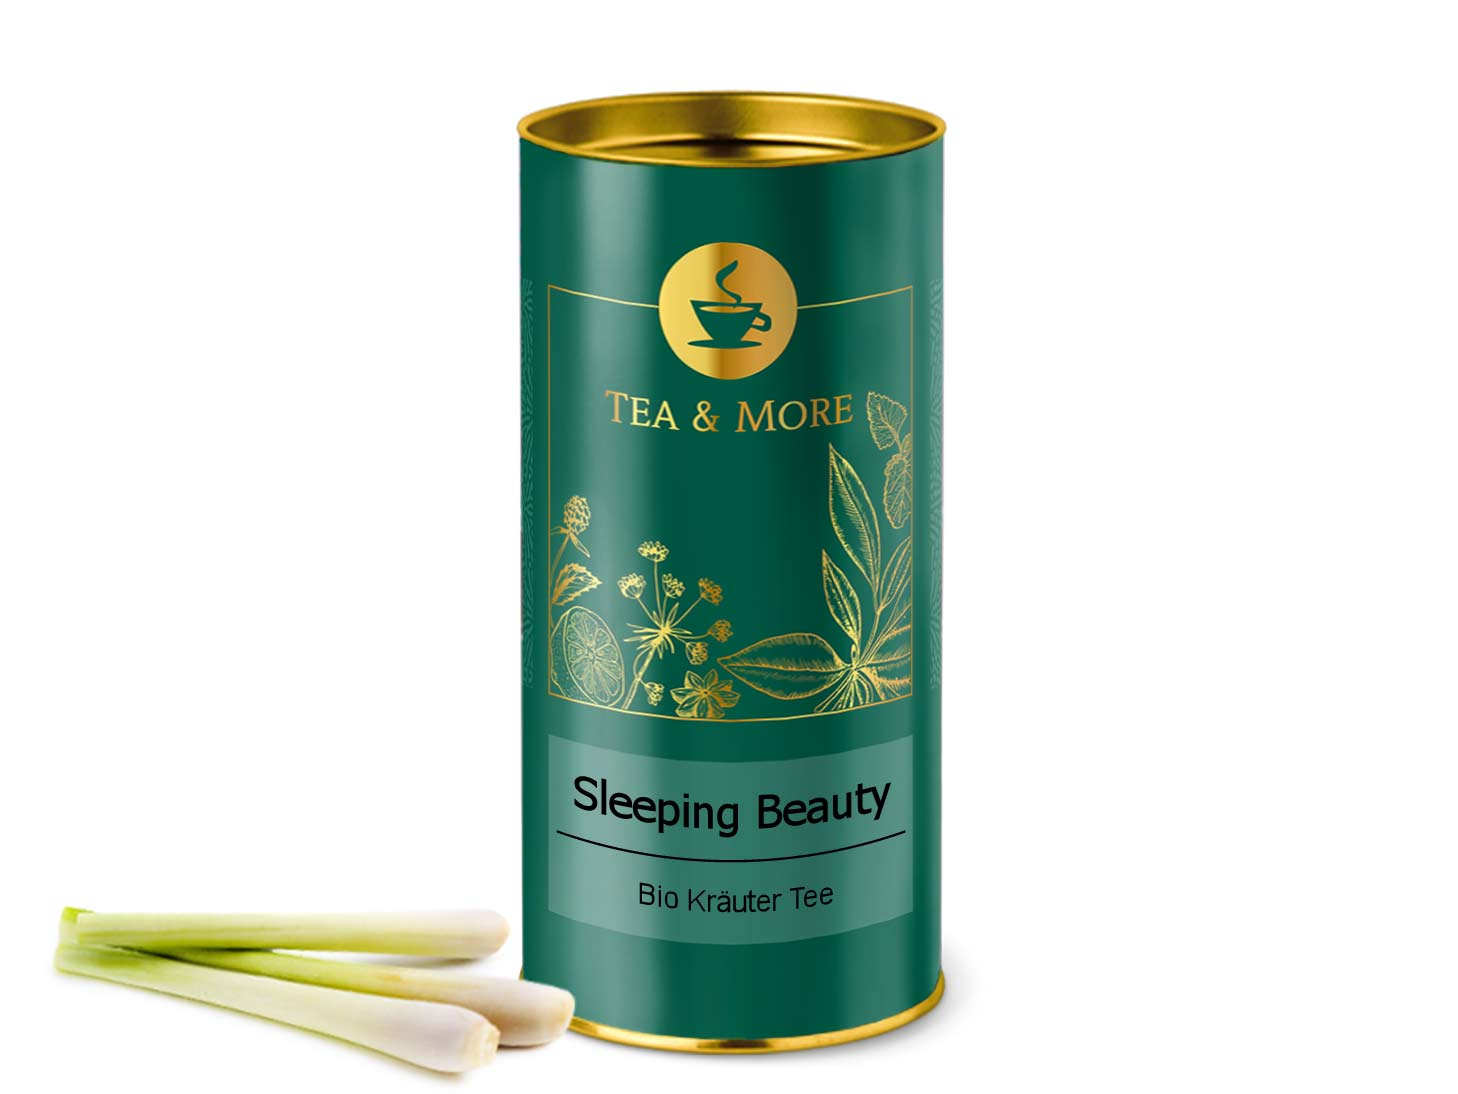 Sleeping Beauty Detox (Bio)